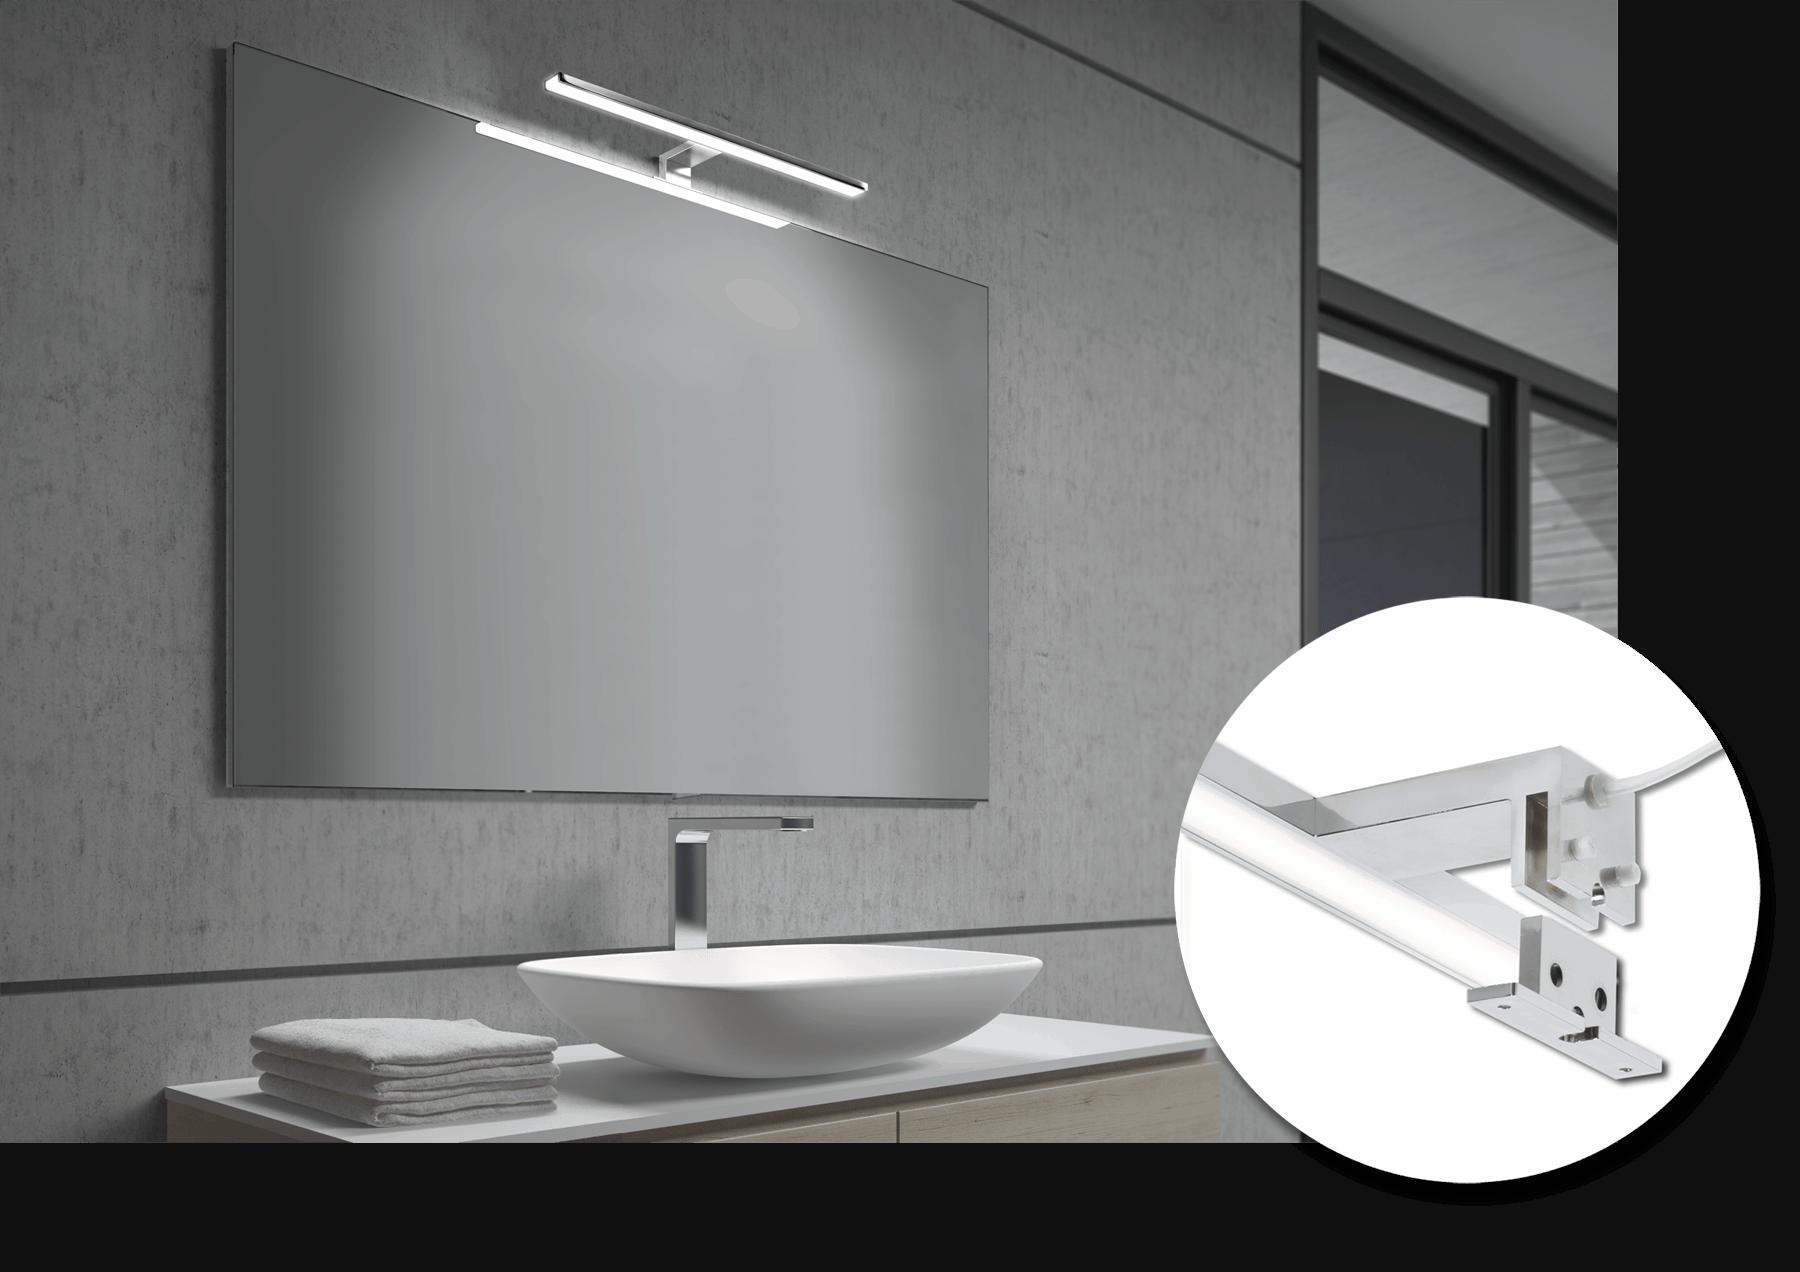 Badmeubel- en spiegelverlichting • Matcall